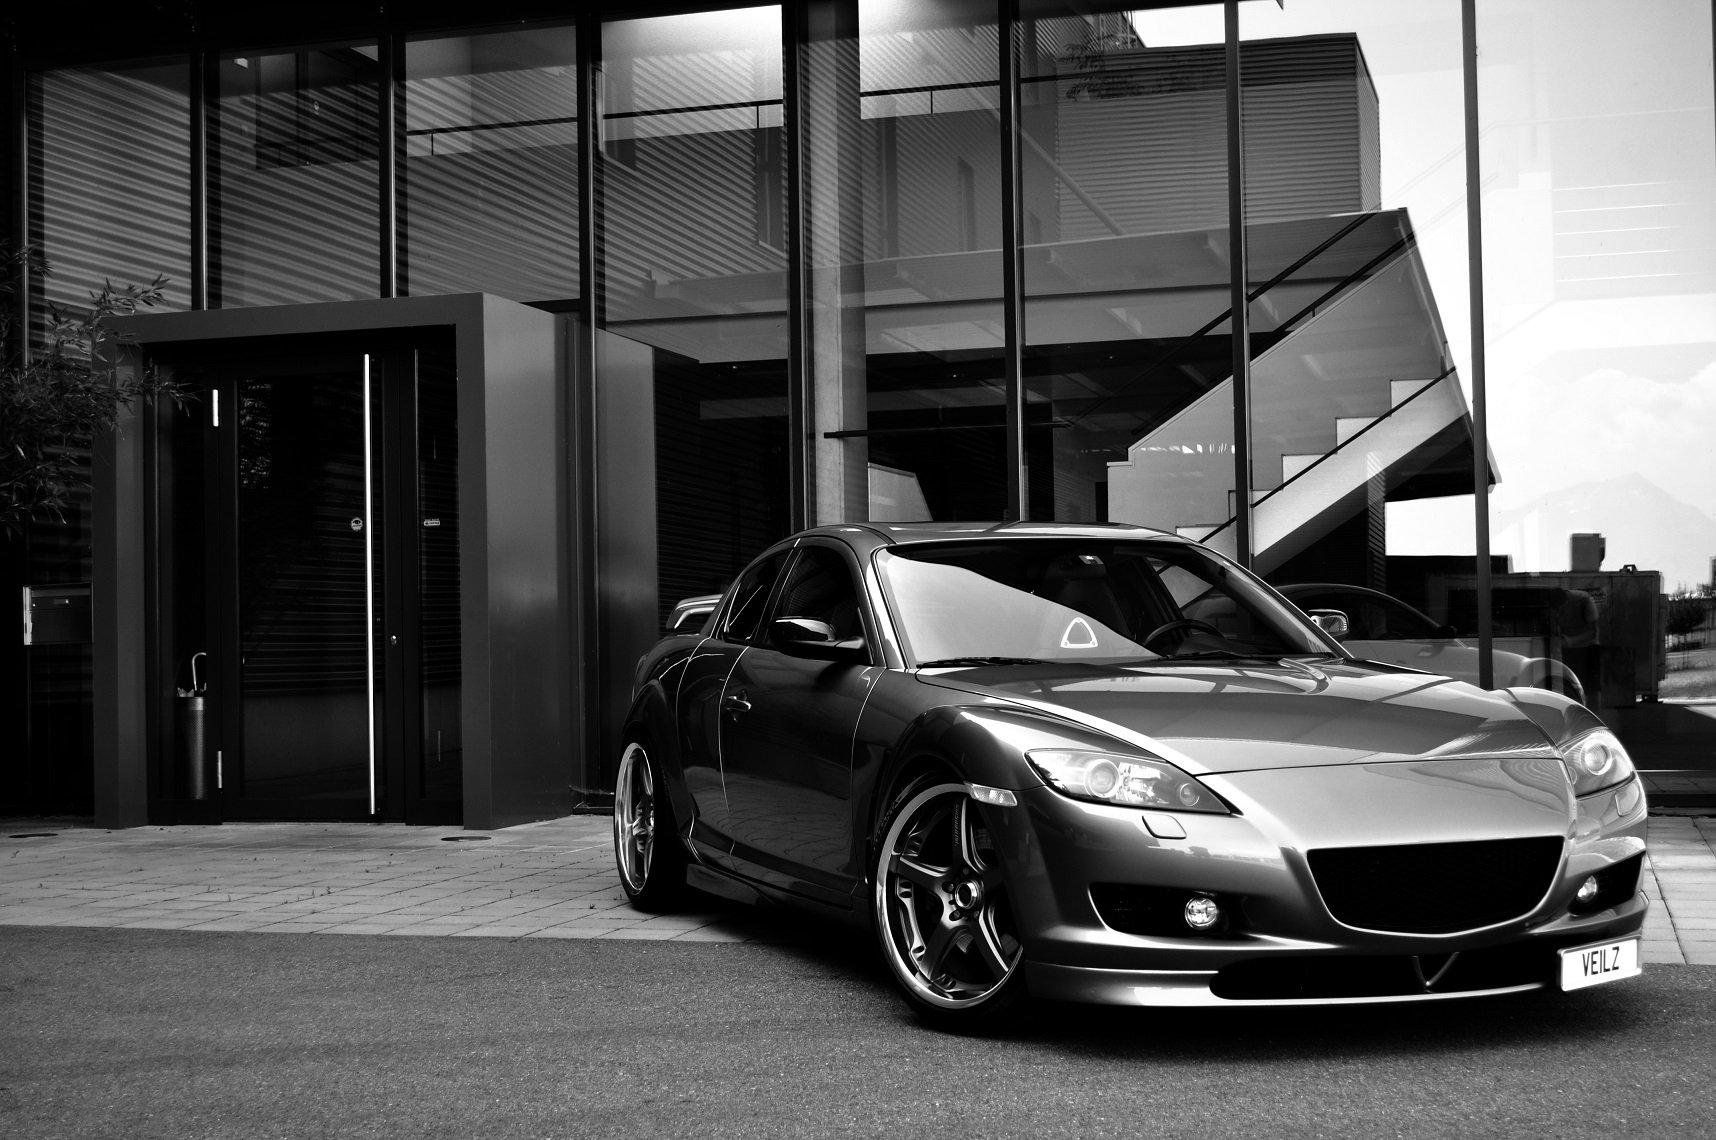 Mazda Rx8 Tuning >> Mazda-RX8 coupe tuning japan body kit cars wallpaper | 1716x1140 | 498696 | WallpaperUP